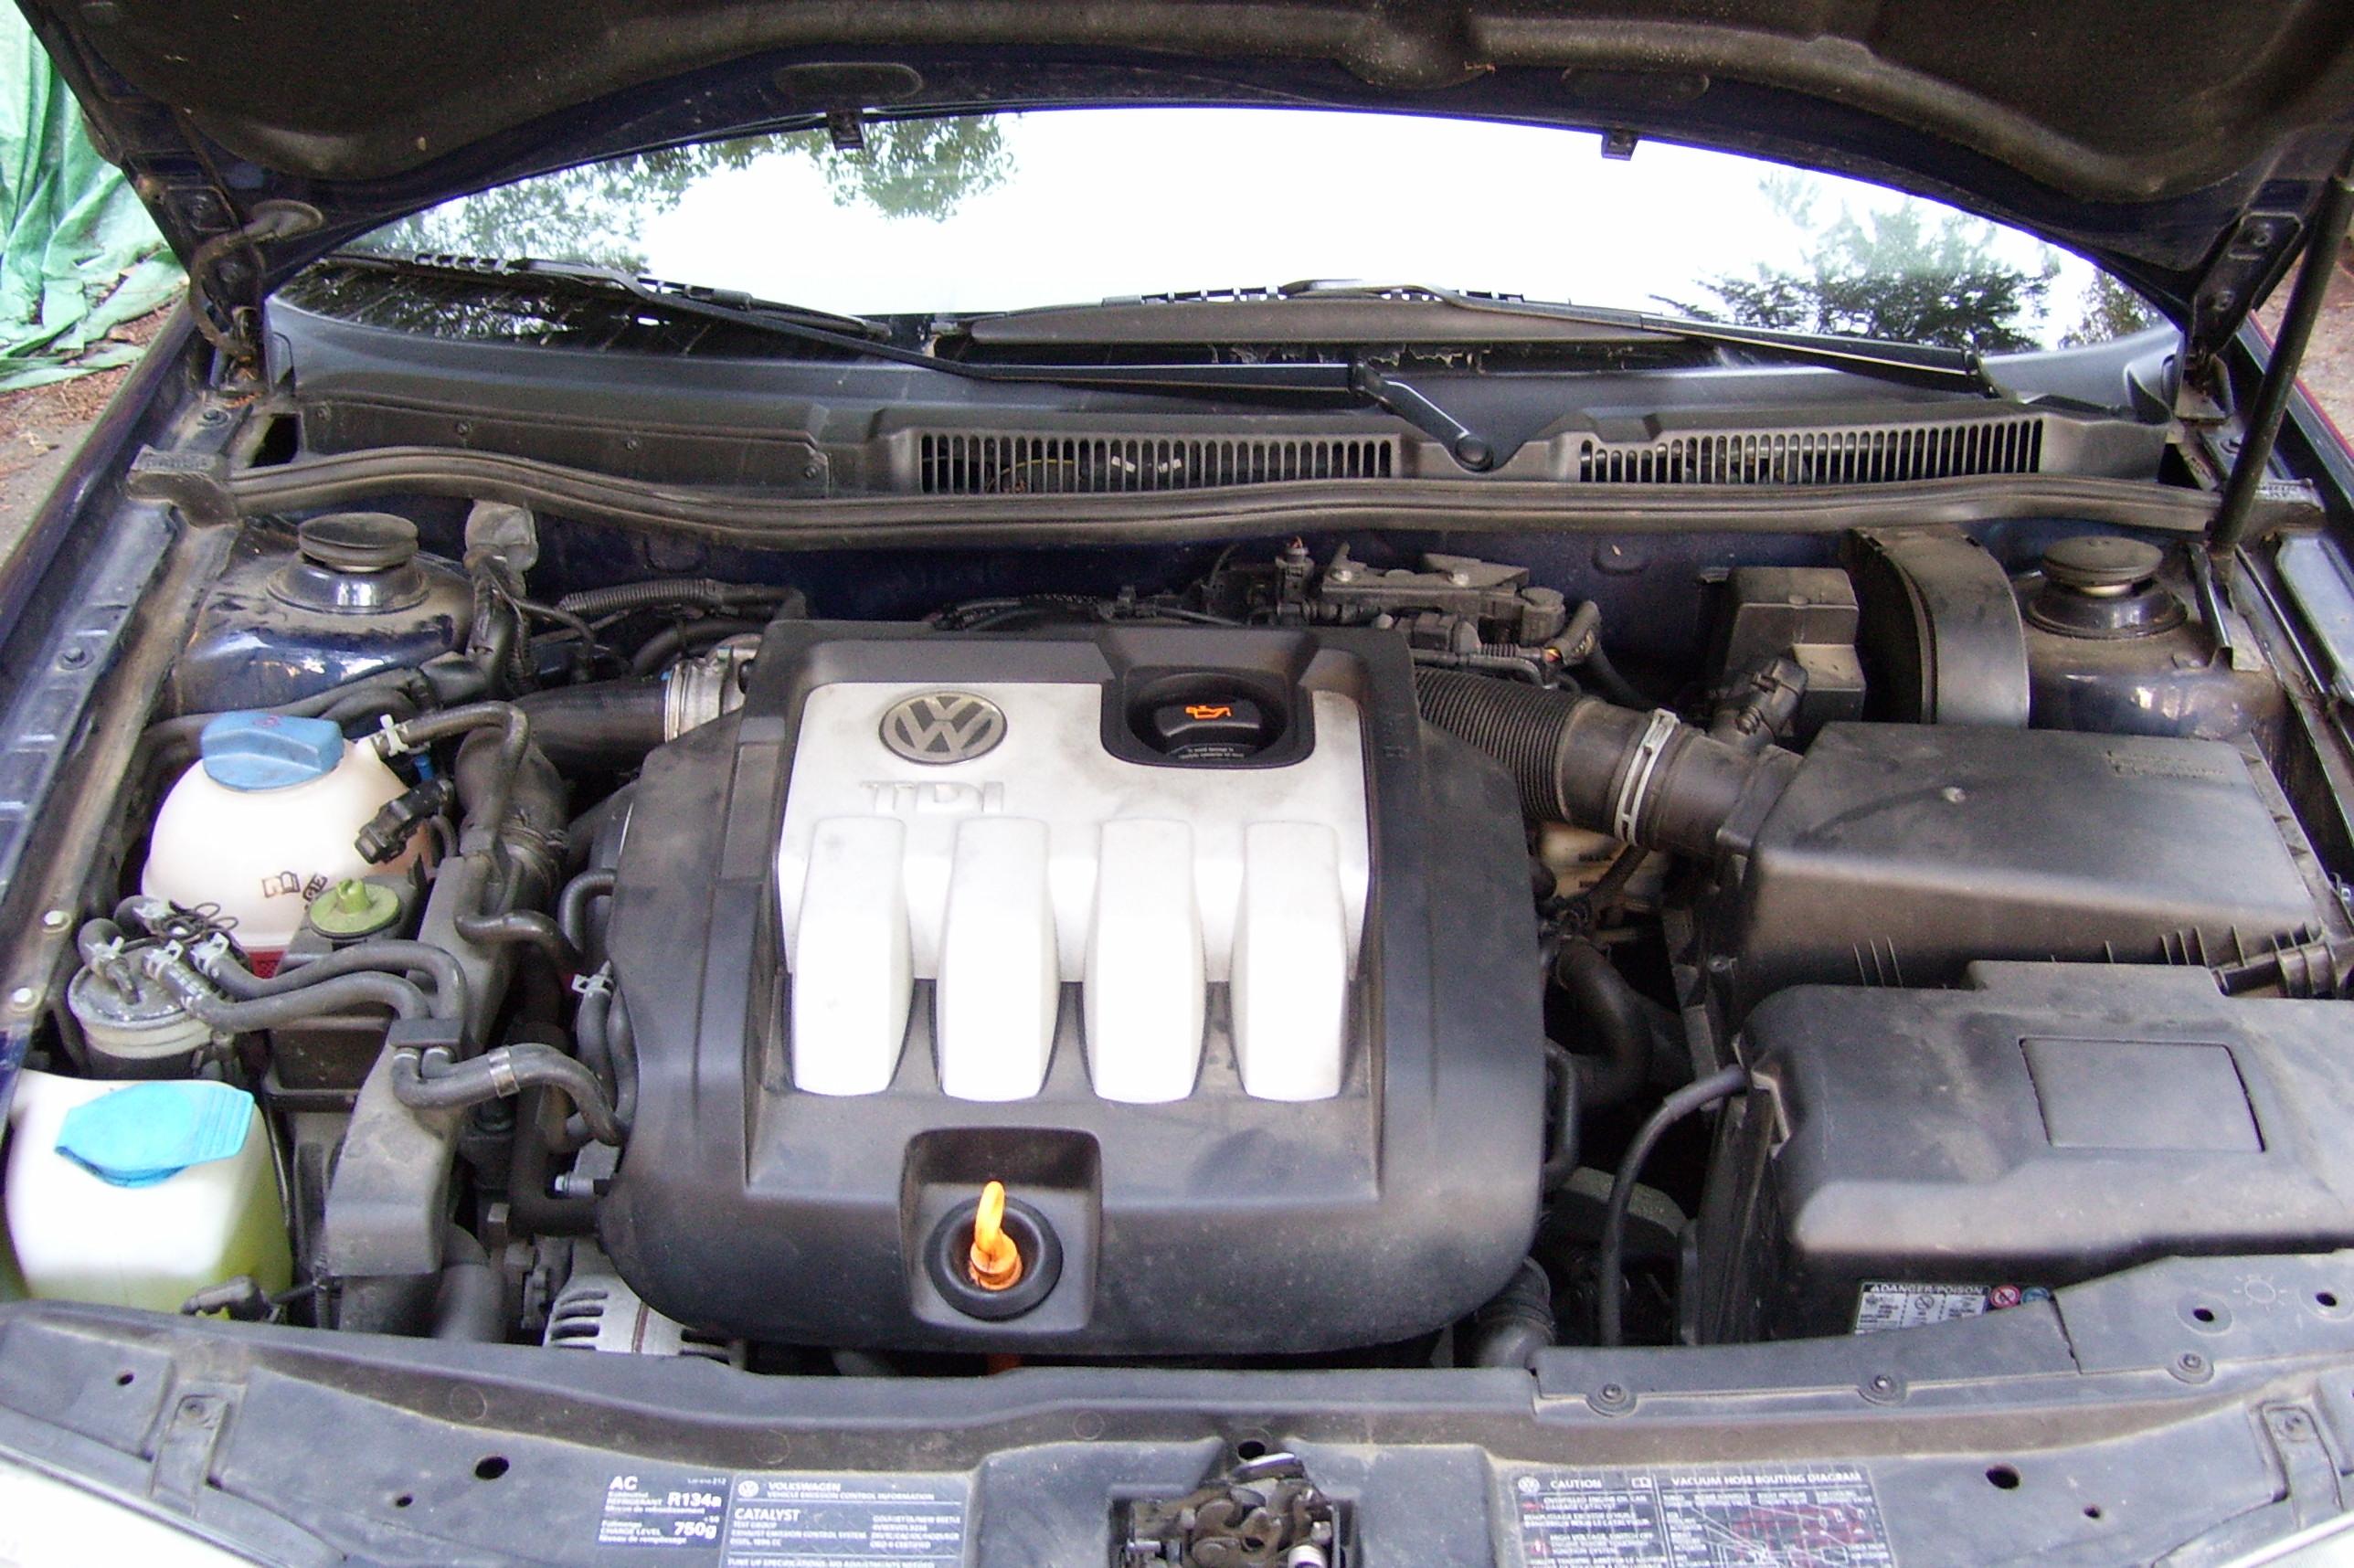 2004 Vw Jetta Tdi Wagon  U00ab Dr  Bj U00f6rn U0026 39 S Auto